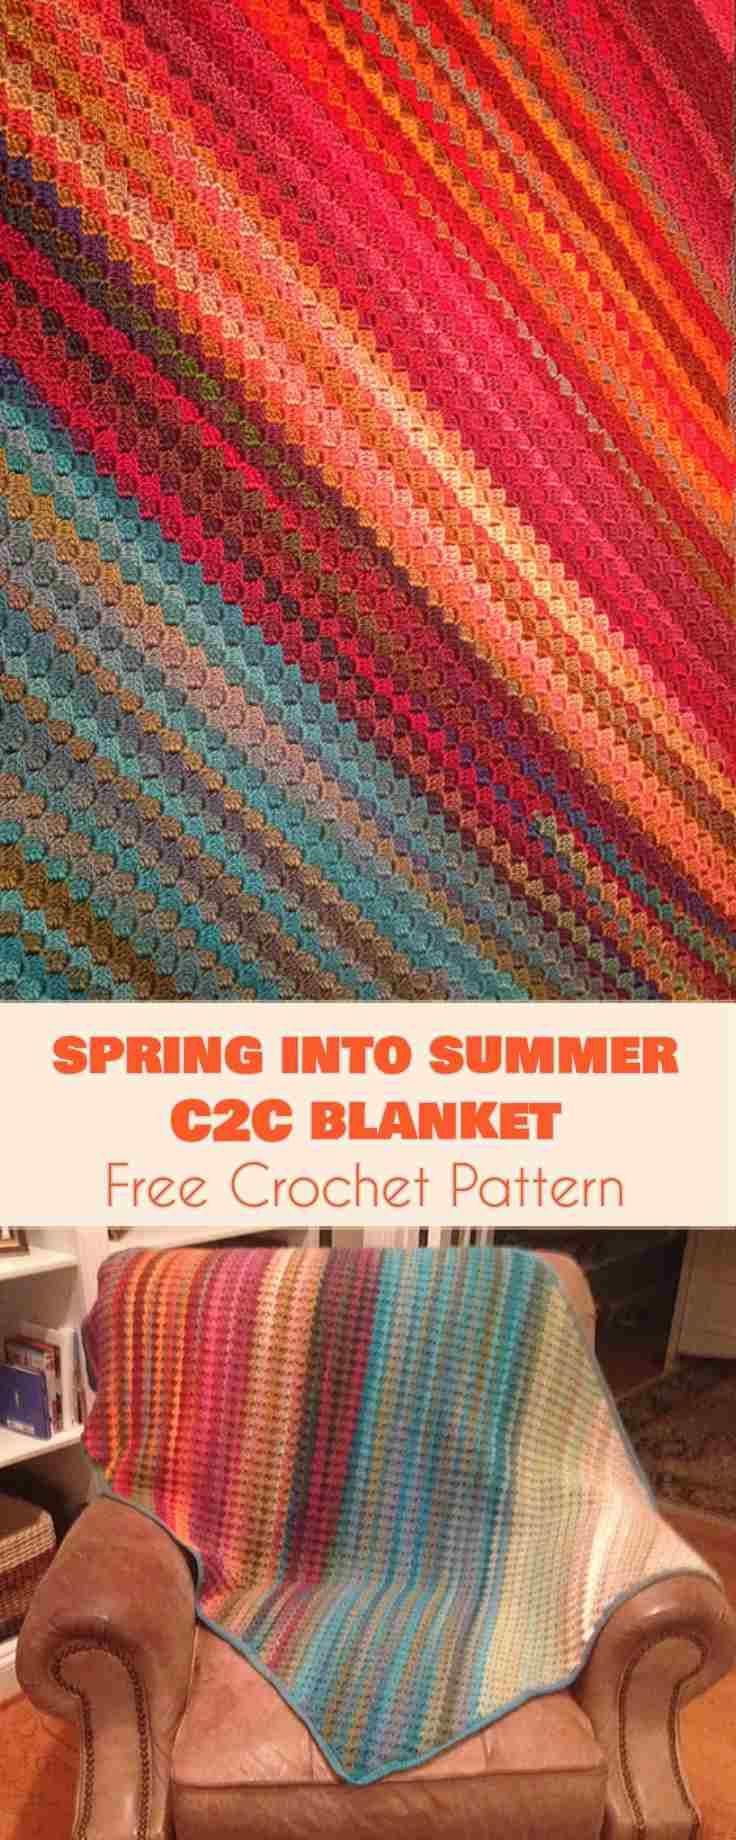 Spring into Summer C2C Baby Blanket [Free Crochet Pattern] | Free ...